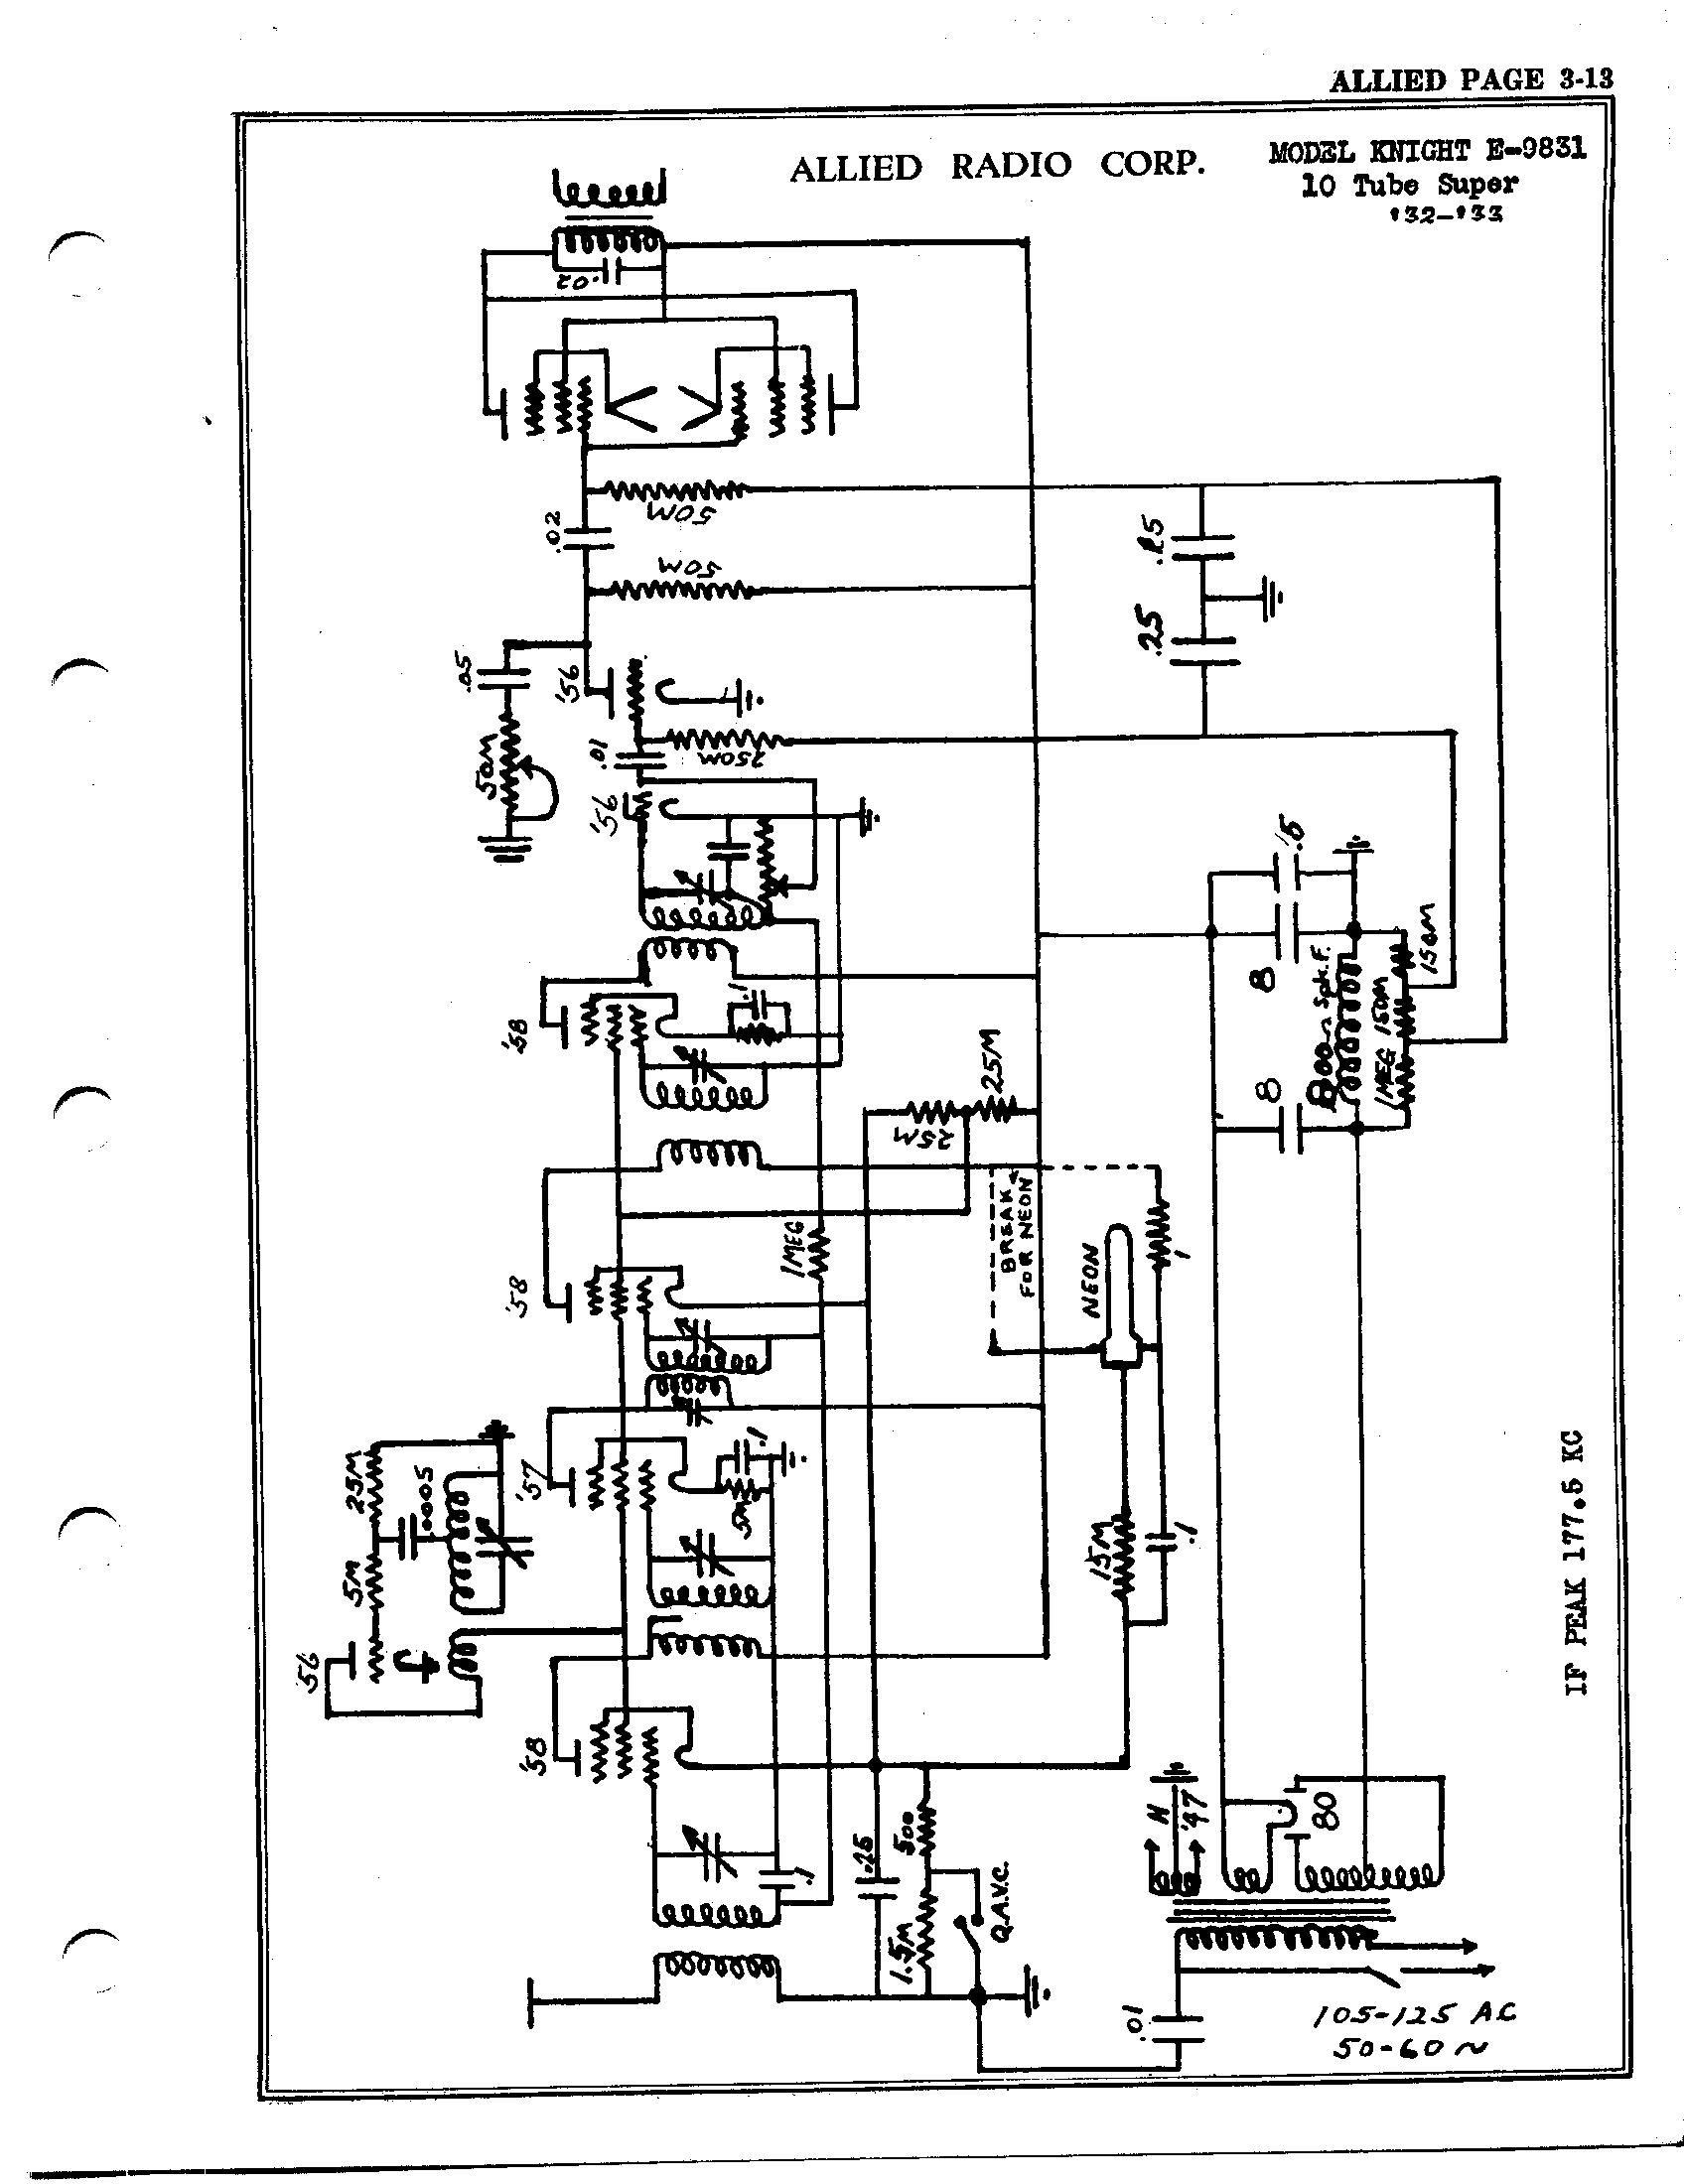 Allied Radio Corp 10 Tube Super